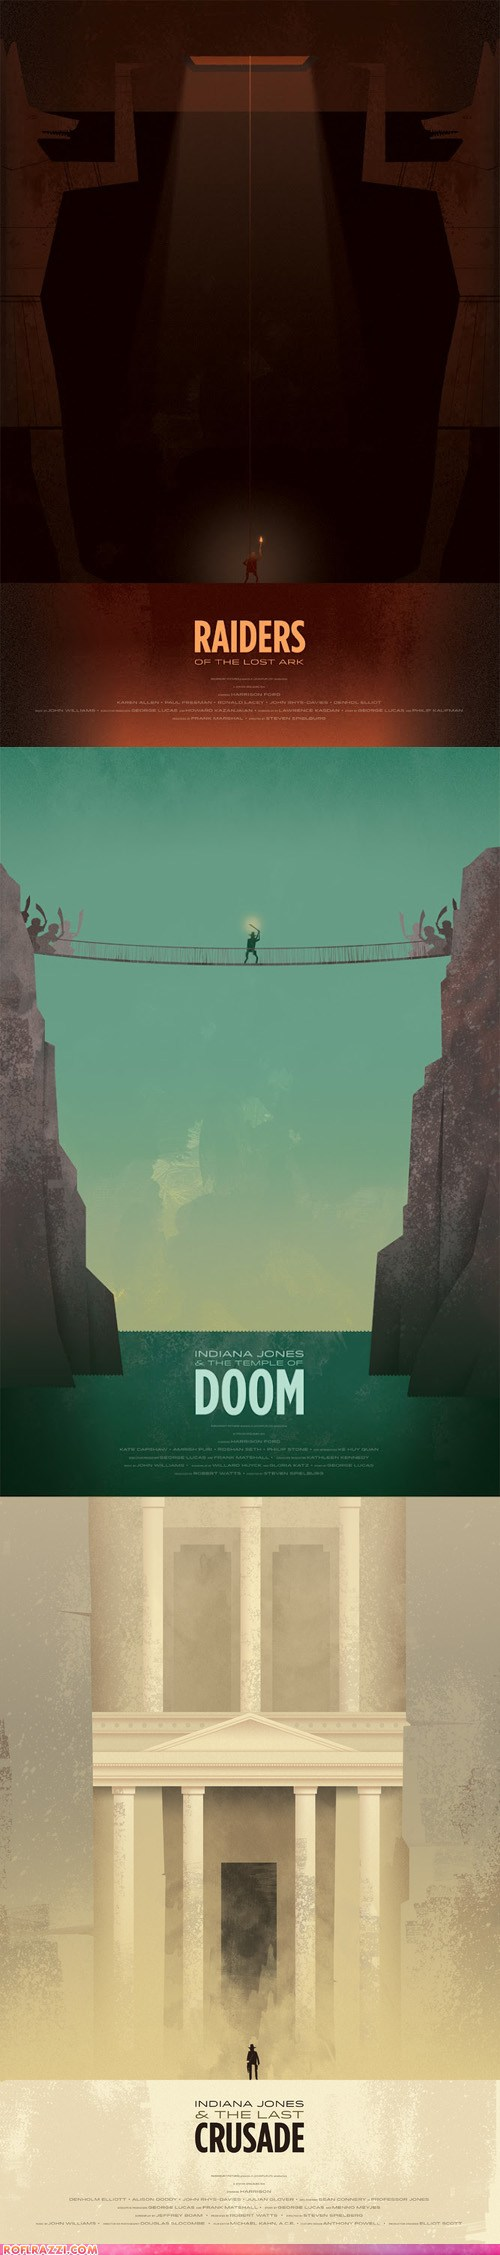 Creative Indiana Jones Trilogy Poster Art